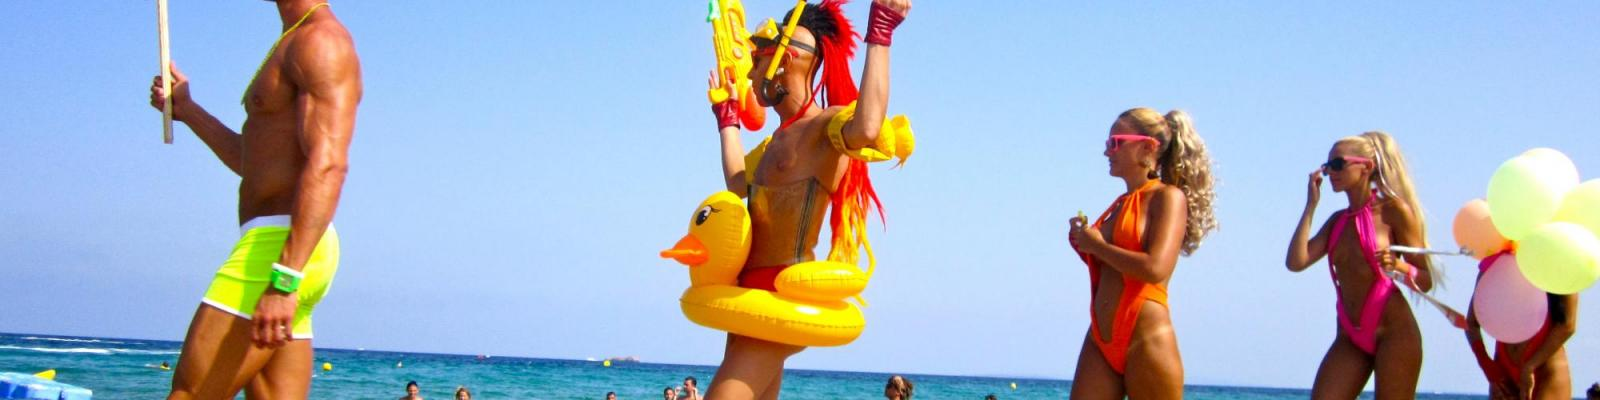 August 2016 Ibiza Deal